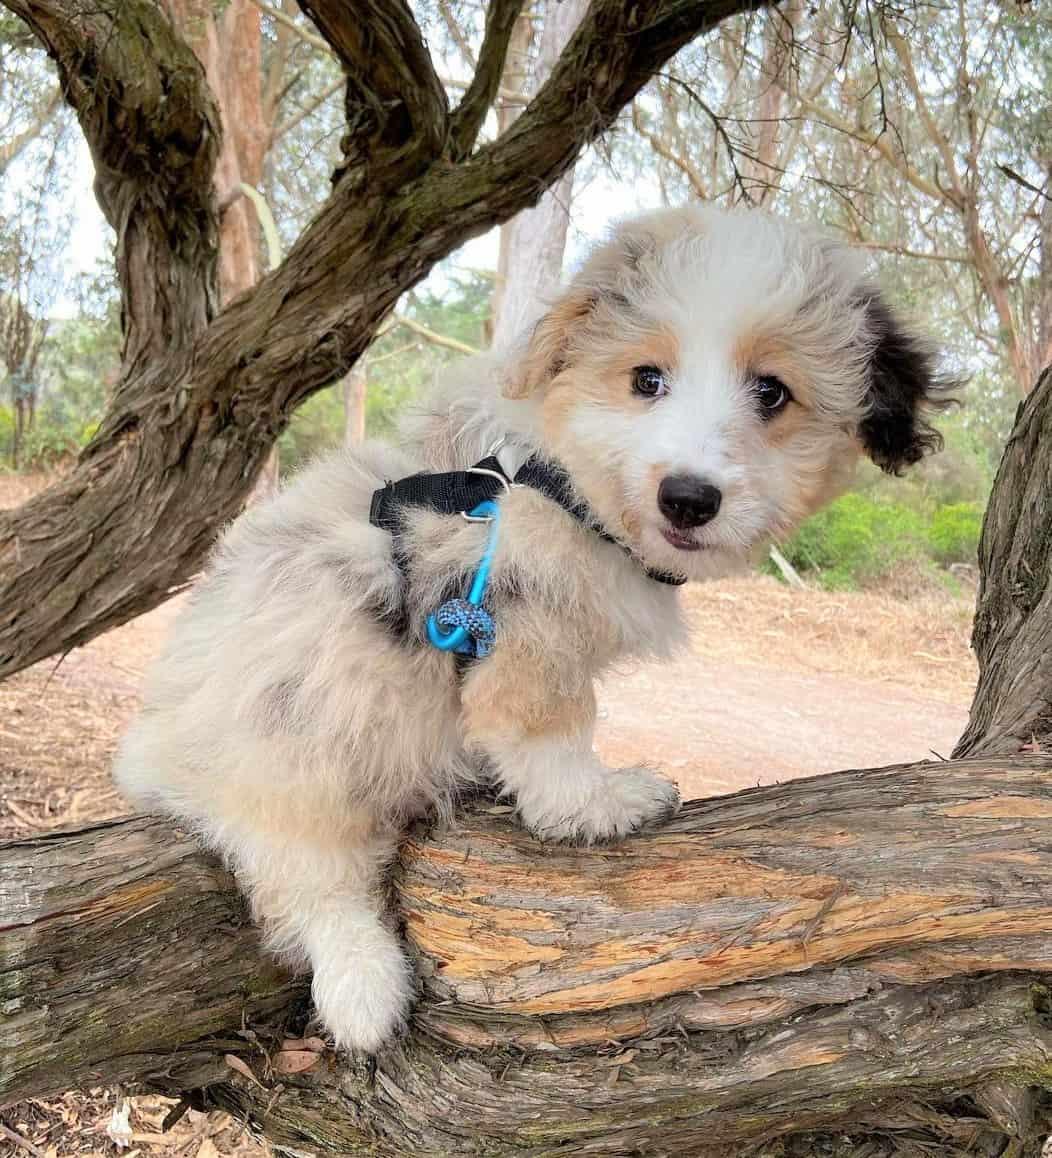 Mini Aussiedoodle climbing on a tree